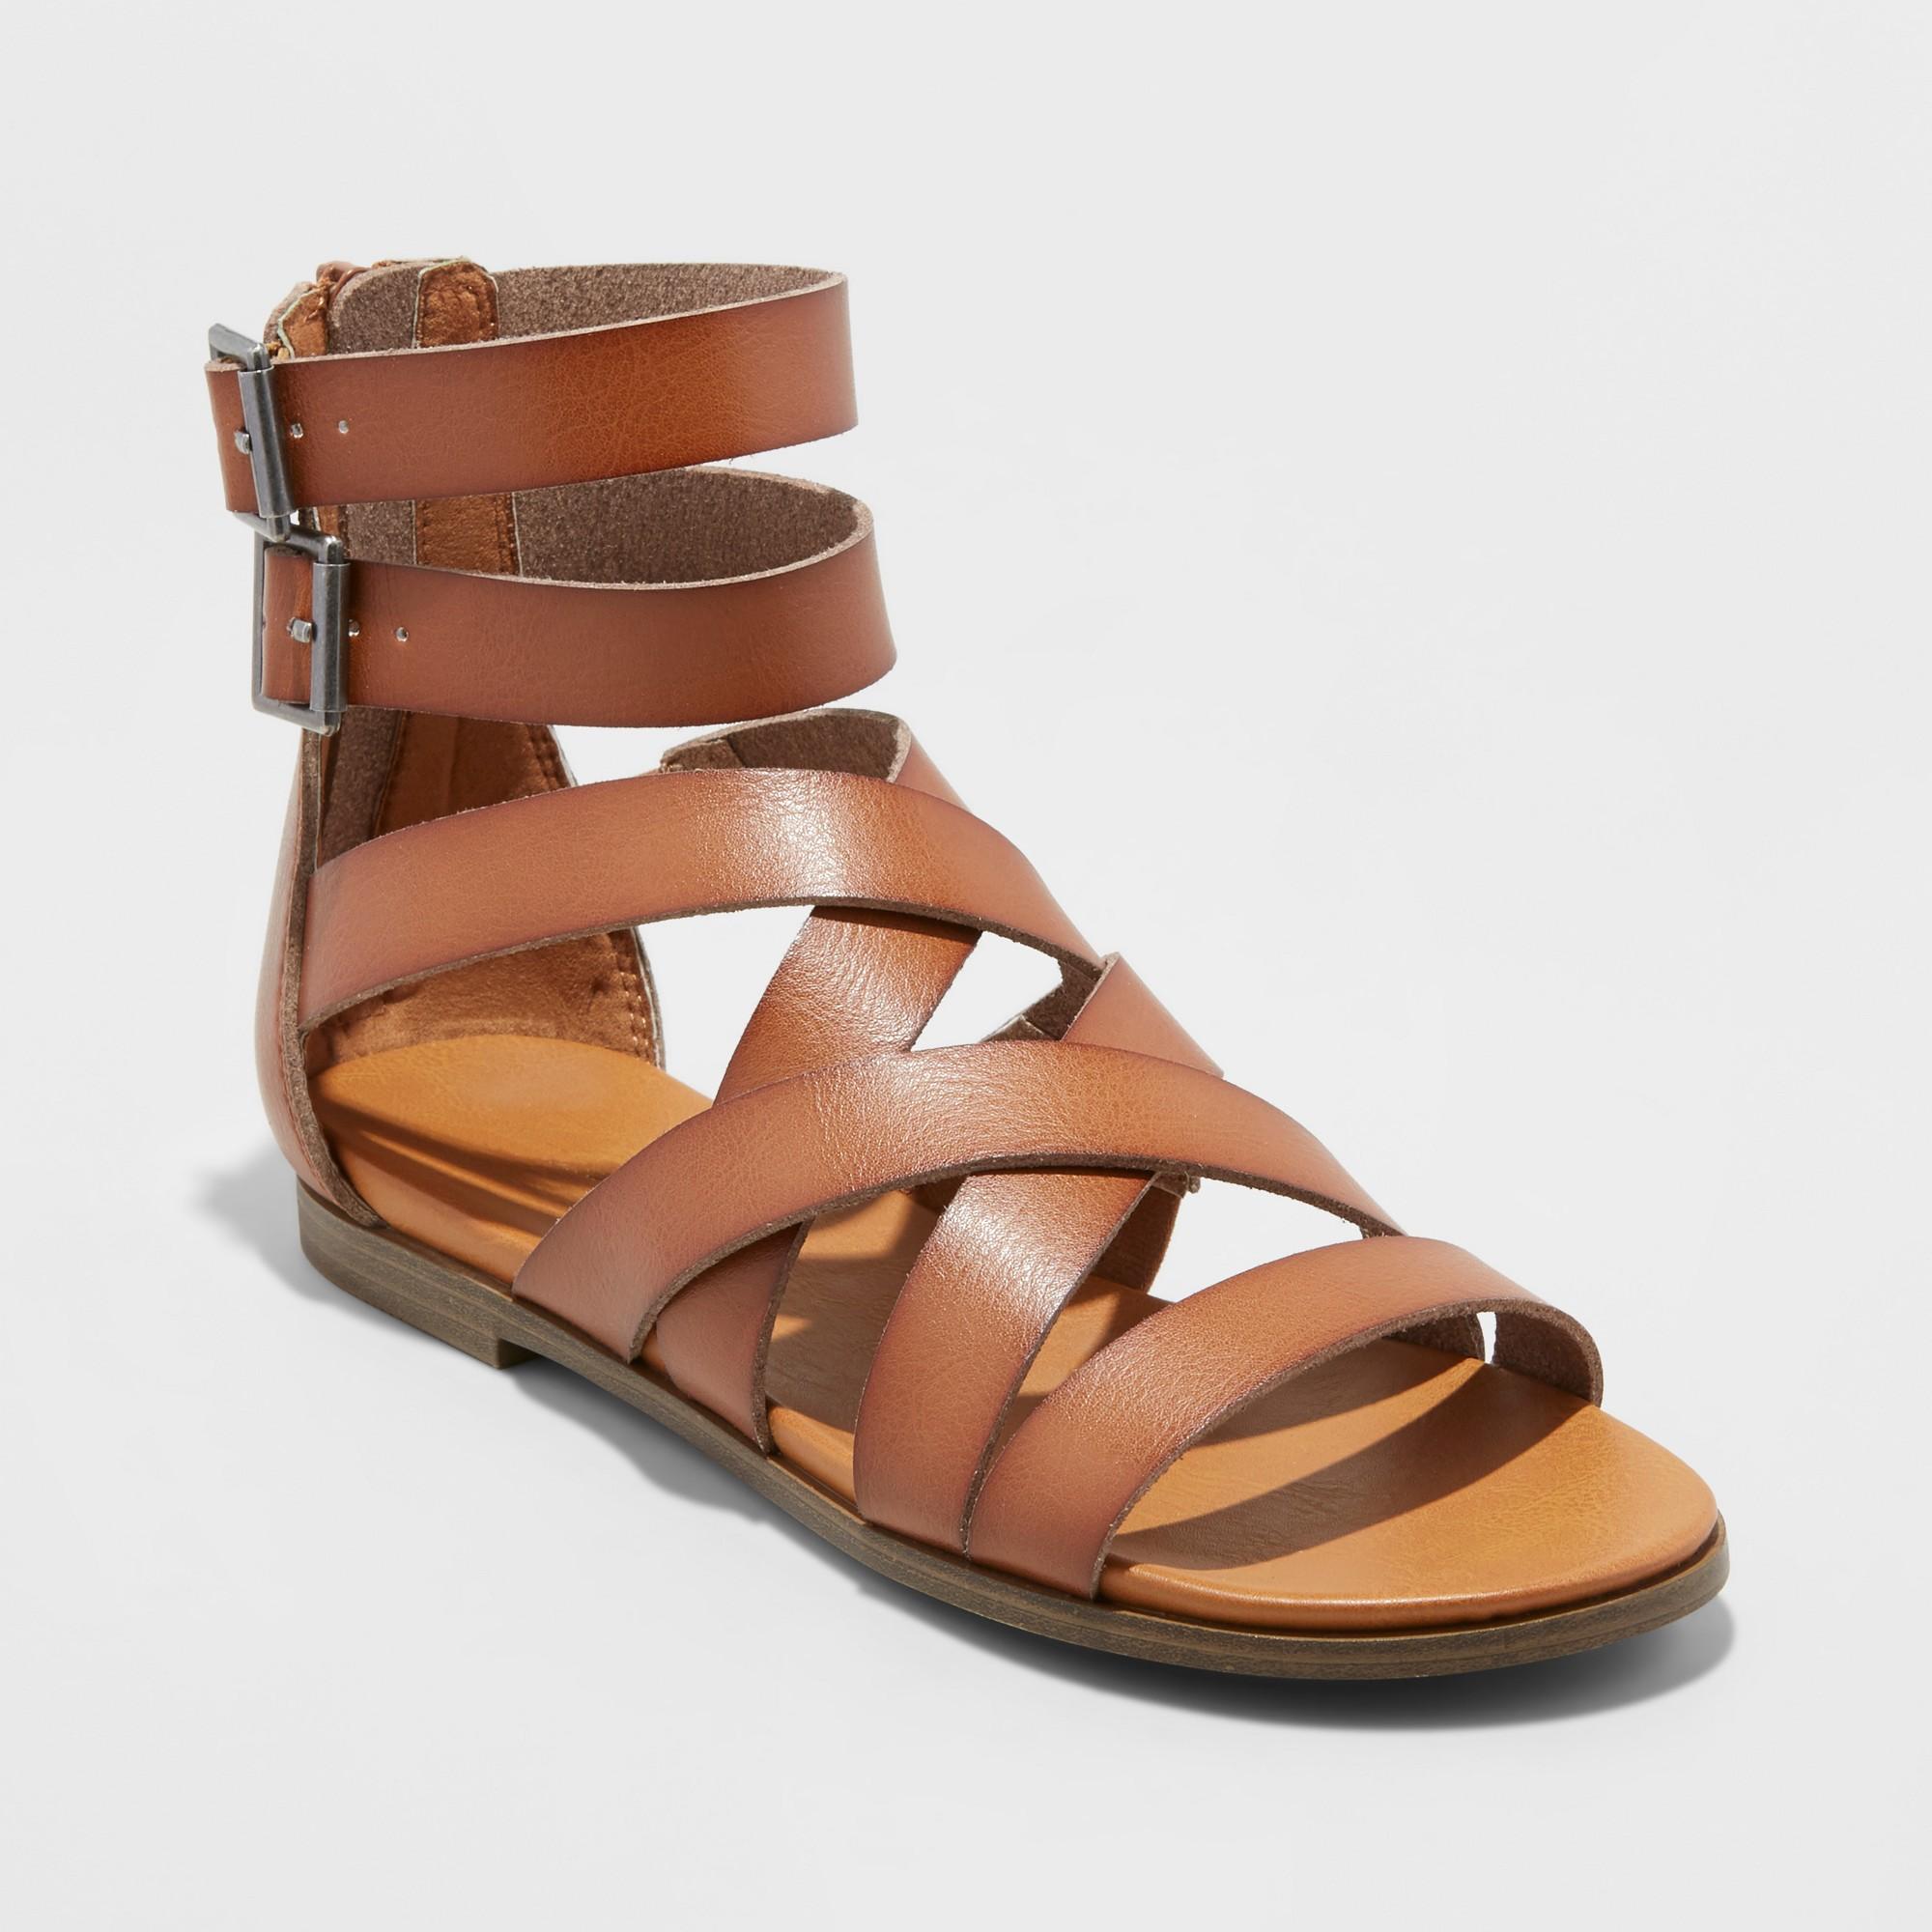 80346acae7f Women s Rosalee Wide Width Gladiator Sandals - Universal Thread Cognac  (Red) 6.5W